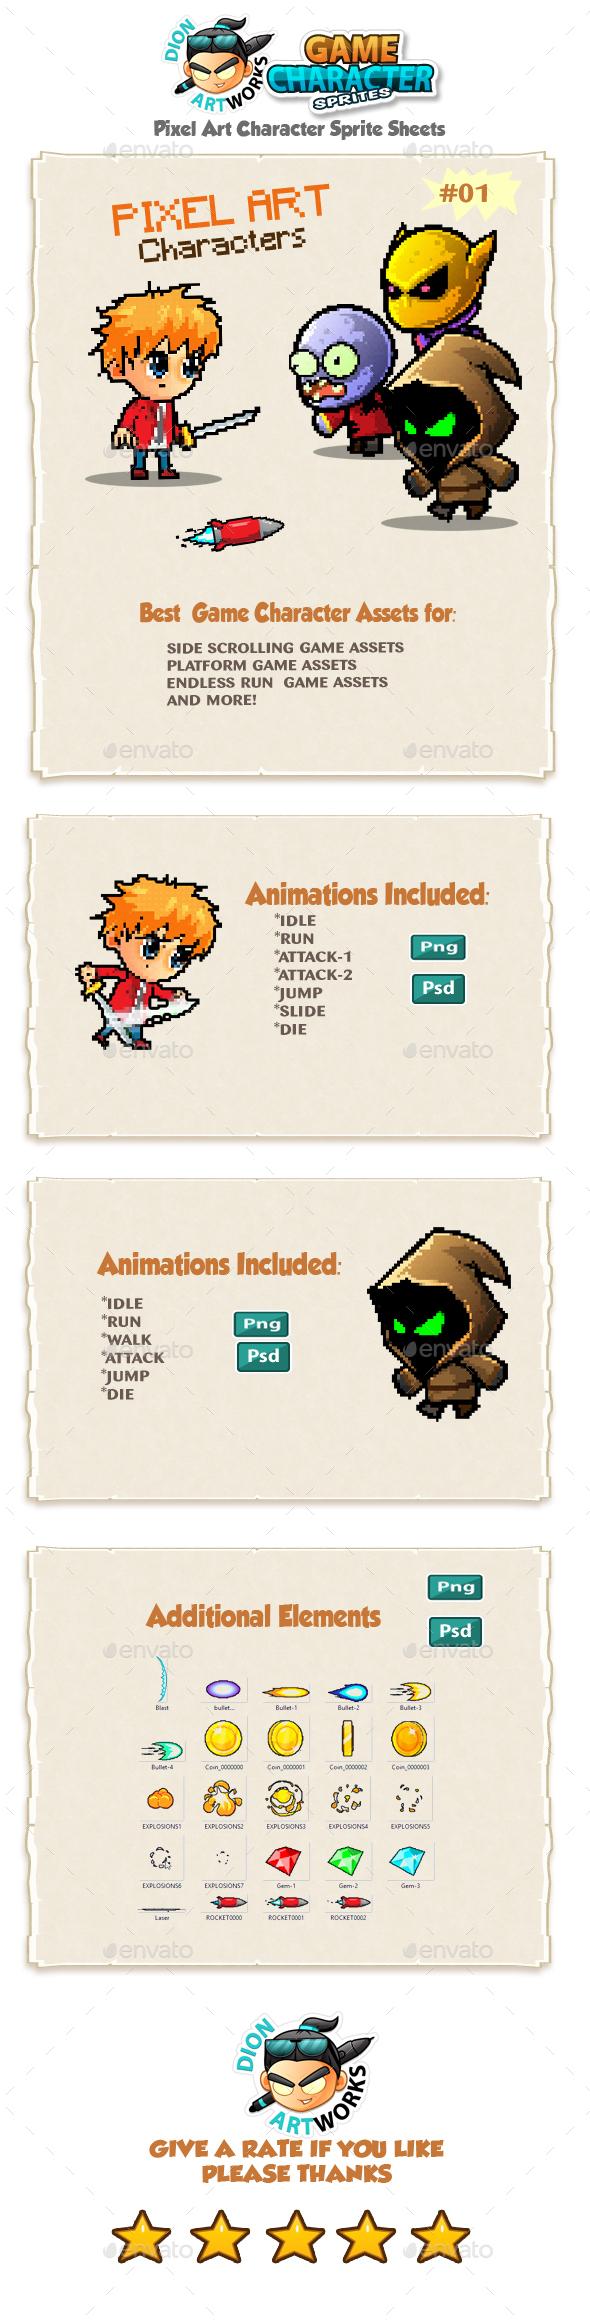 Pixel Art Game Character Sprites 01 - Sprites Game Assets